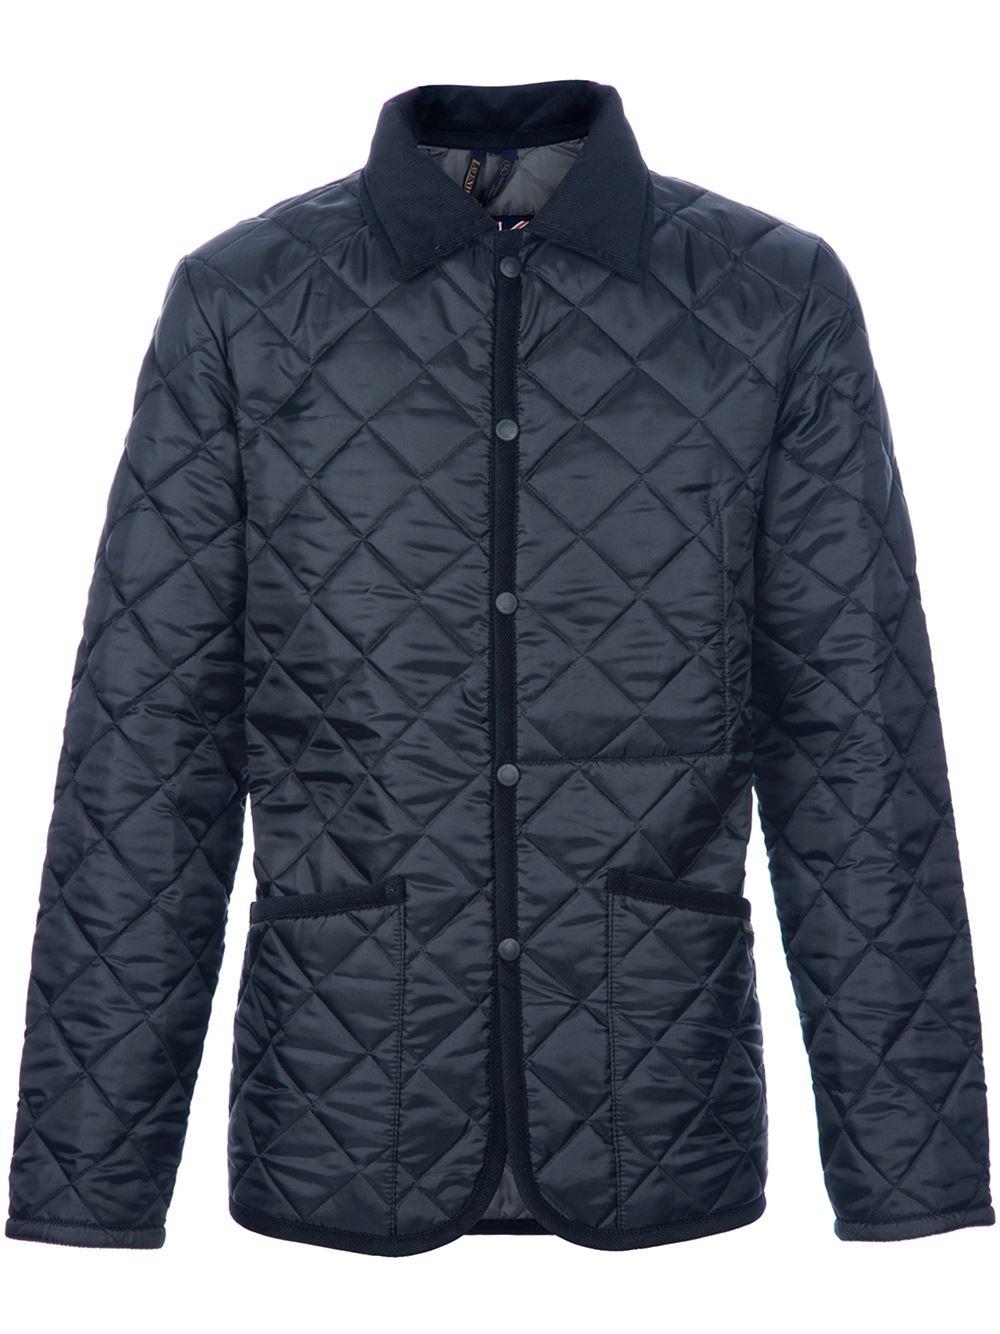 Quilted bunda britské značky Lavenham 686c6dd7c0